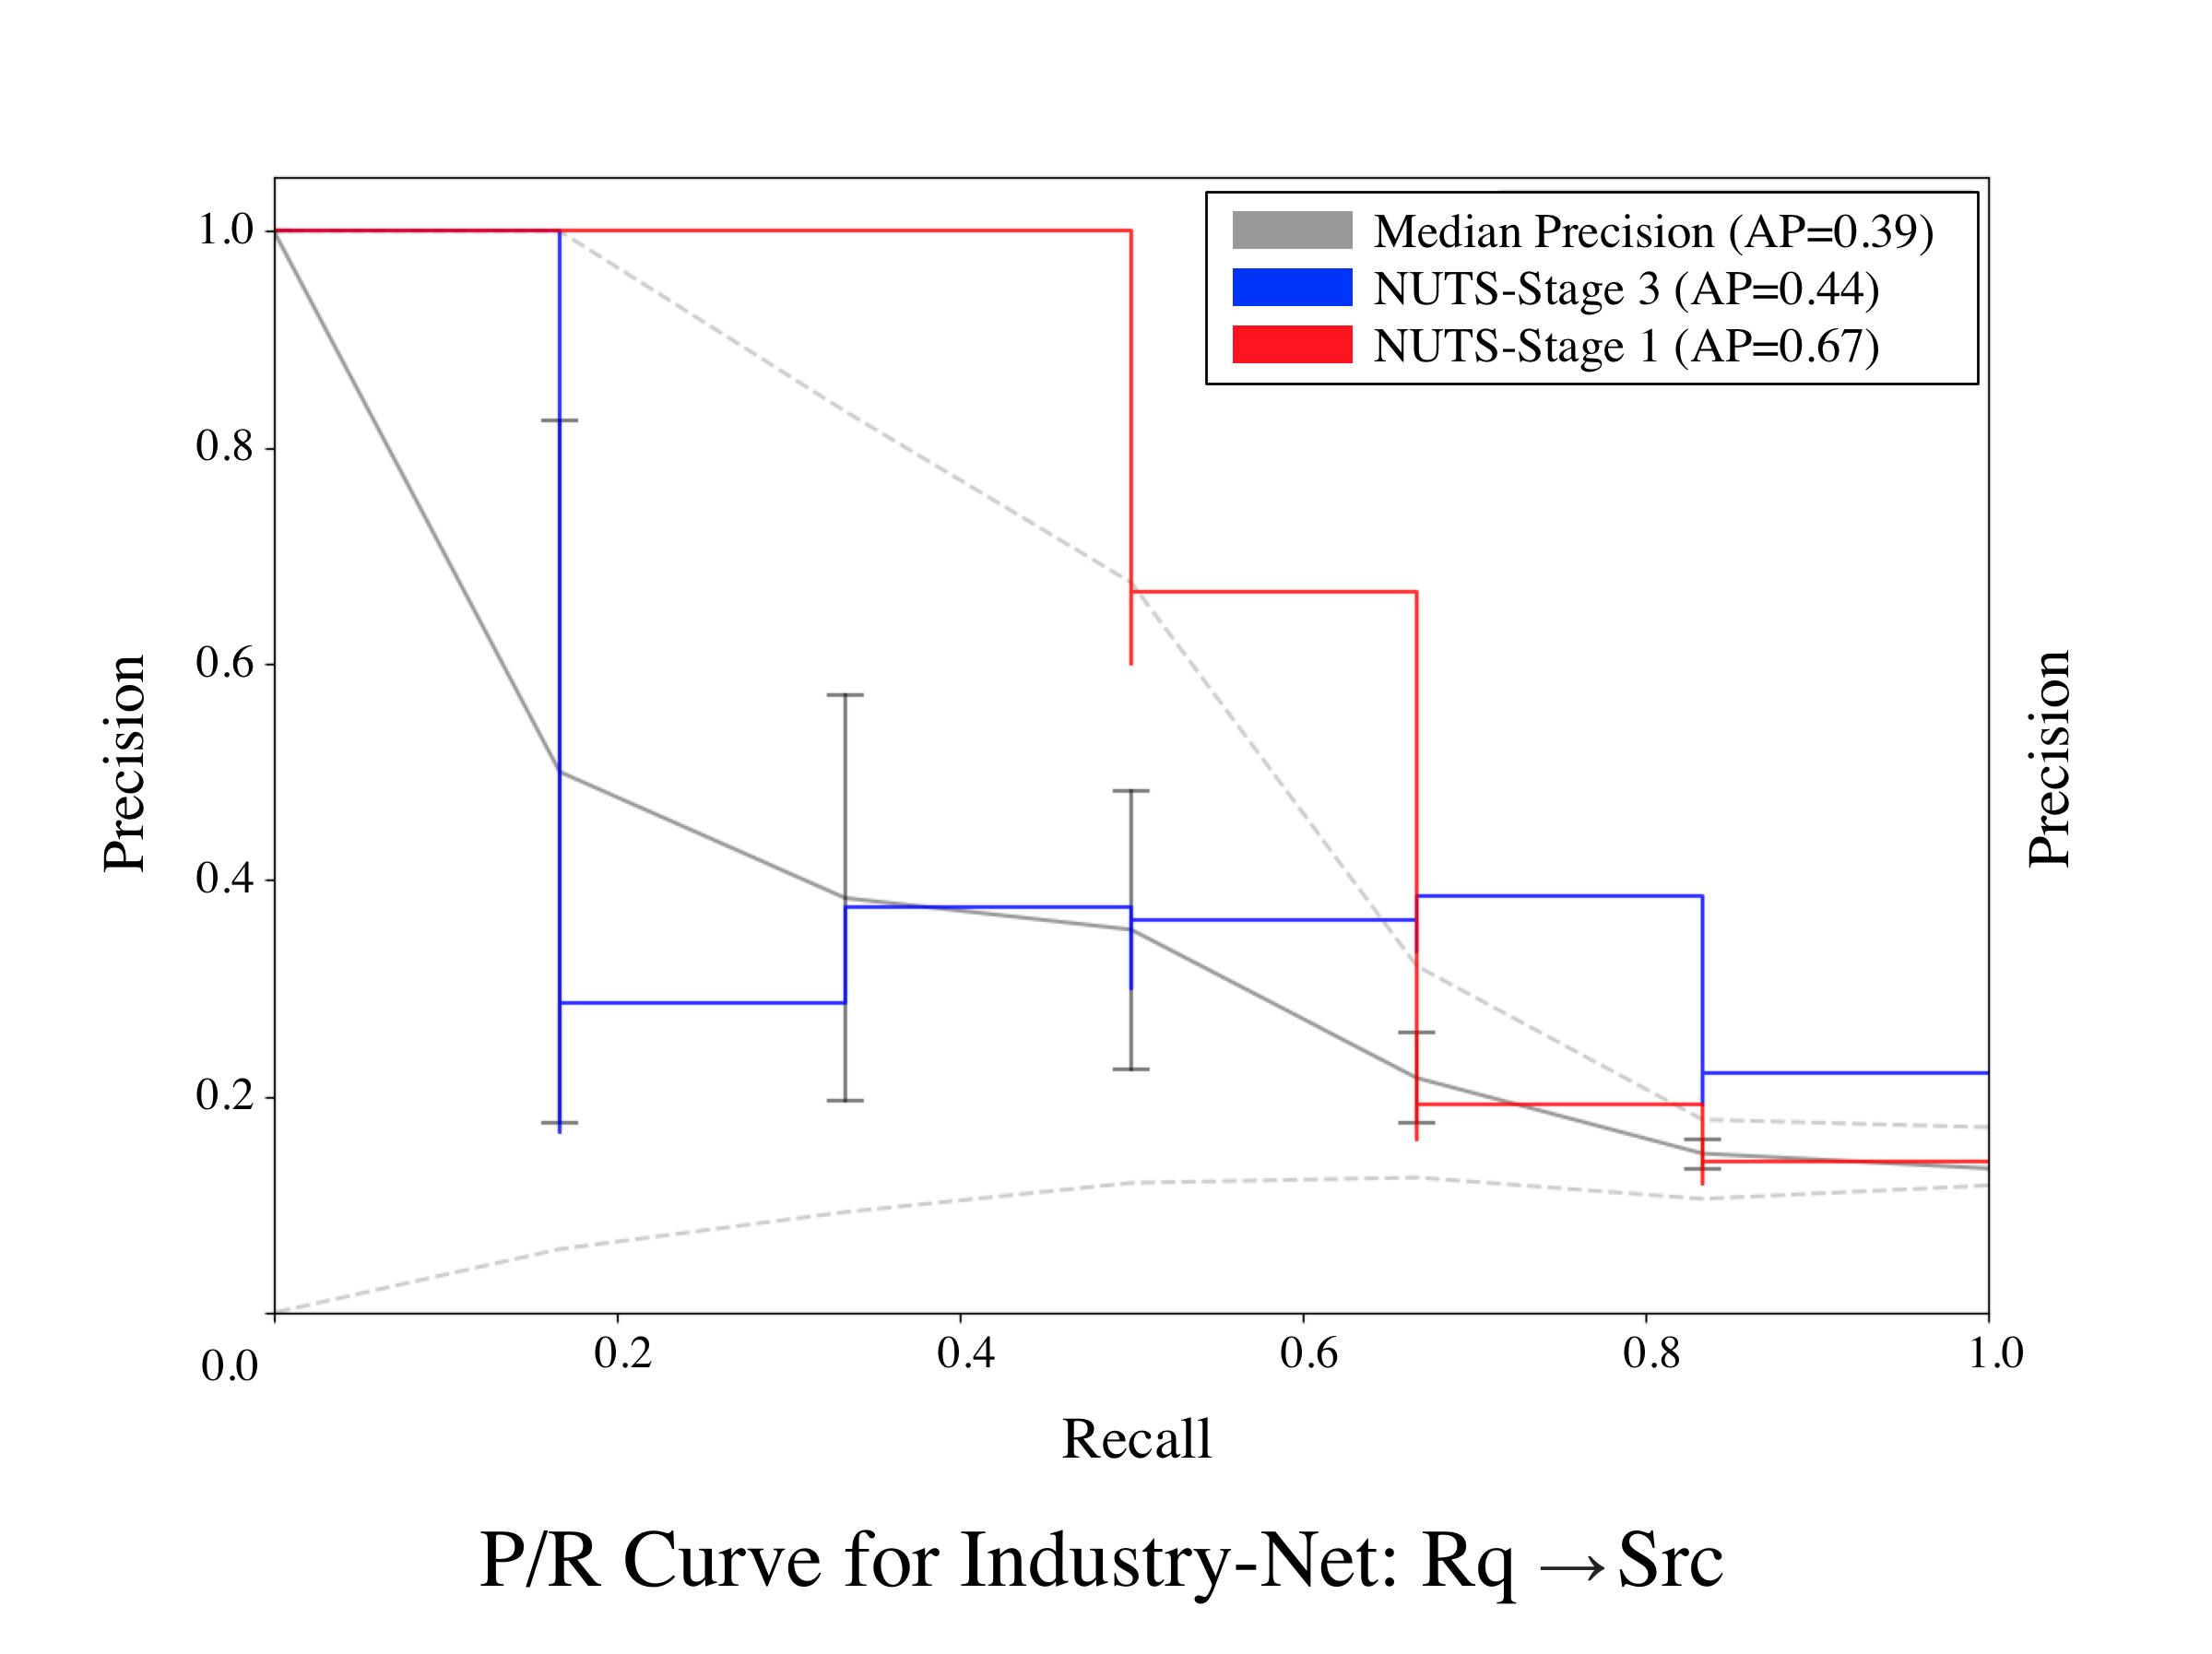 Industry-Net-Rq-Src-0.5.png